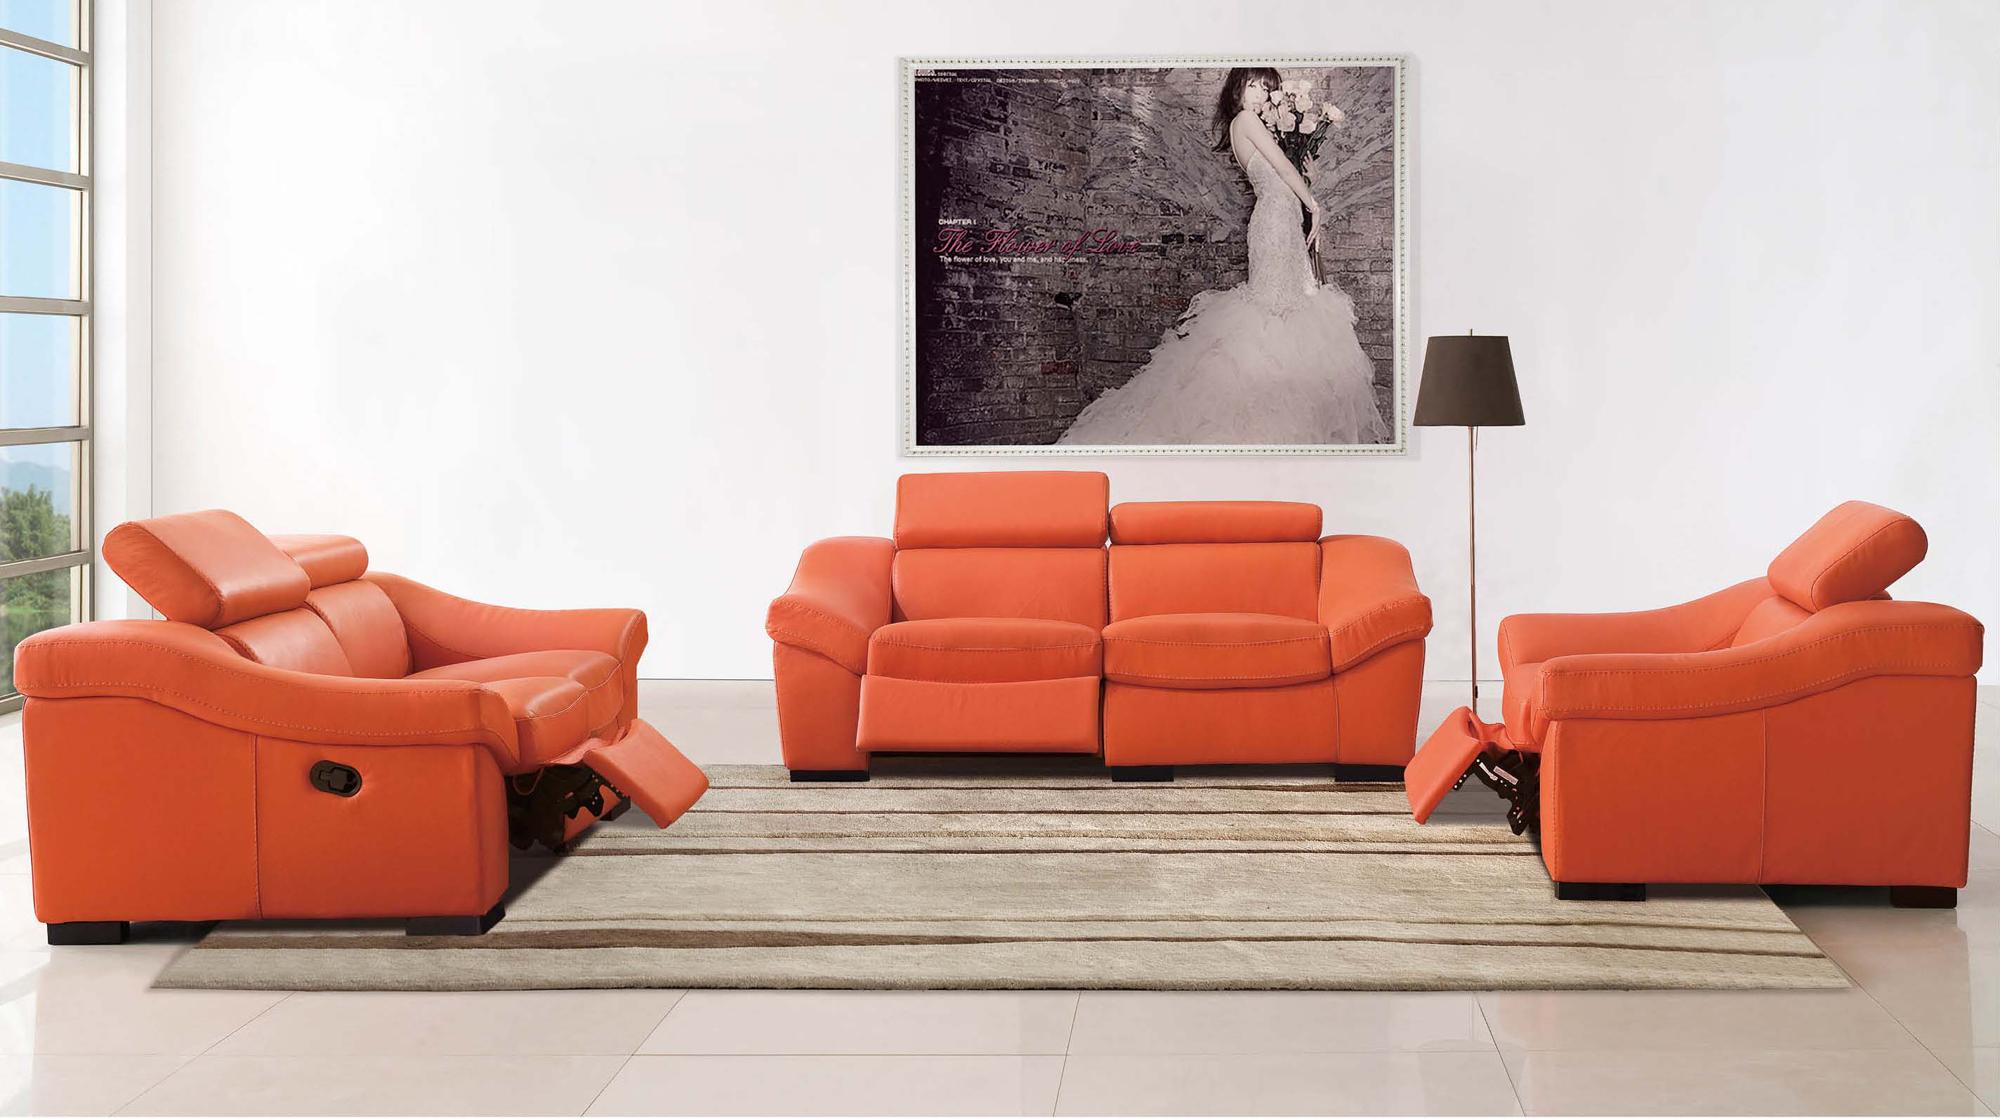 Pleasant 8021 Leather Split Loveseat With Recliner By Esf Uwap Interior Chair Design Uwaporg